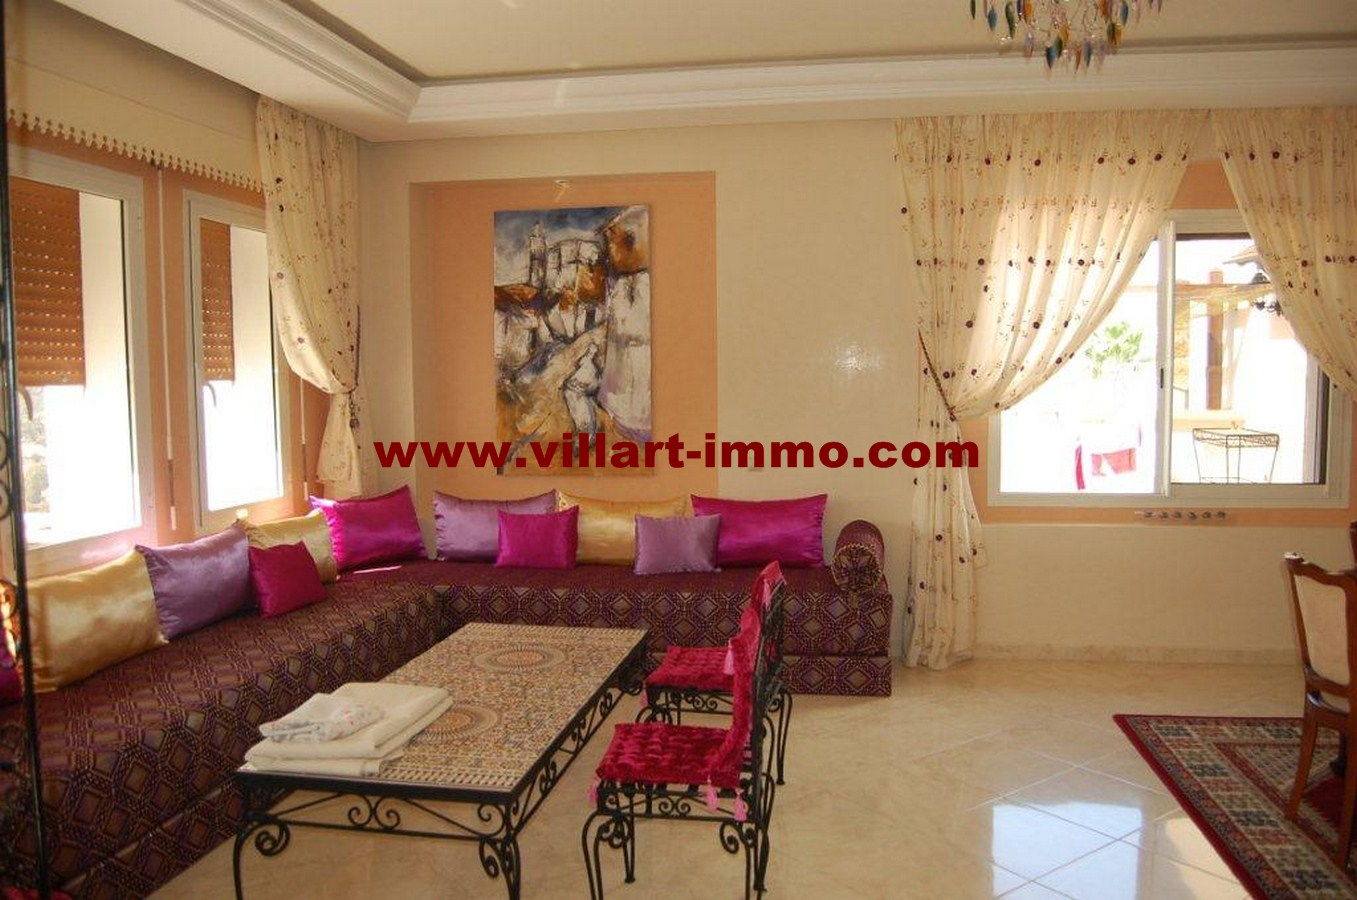 3-vente-appartement-tanger-la-montagne-salon-3-va452-villart-immo